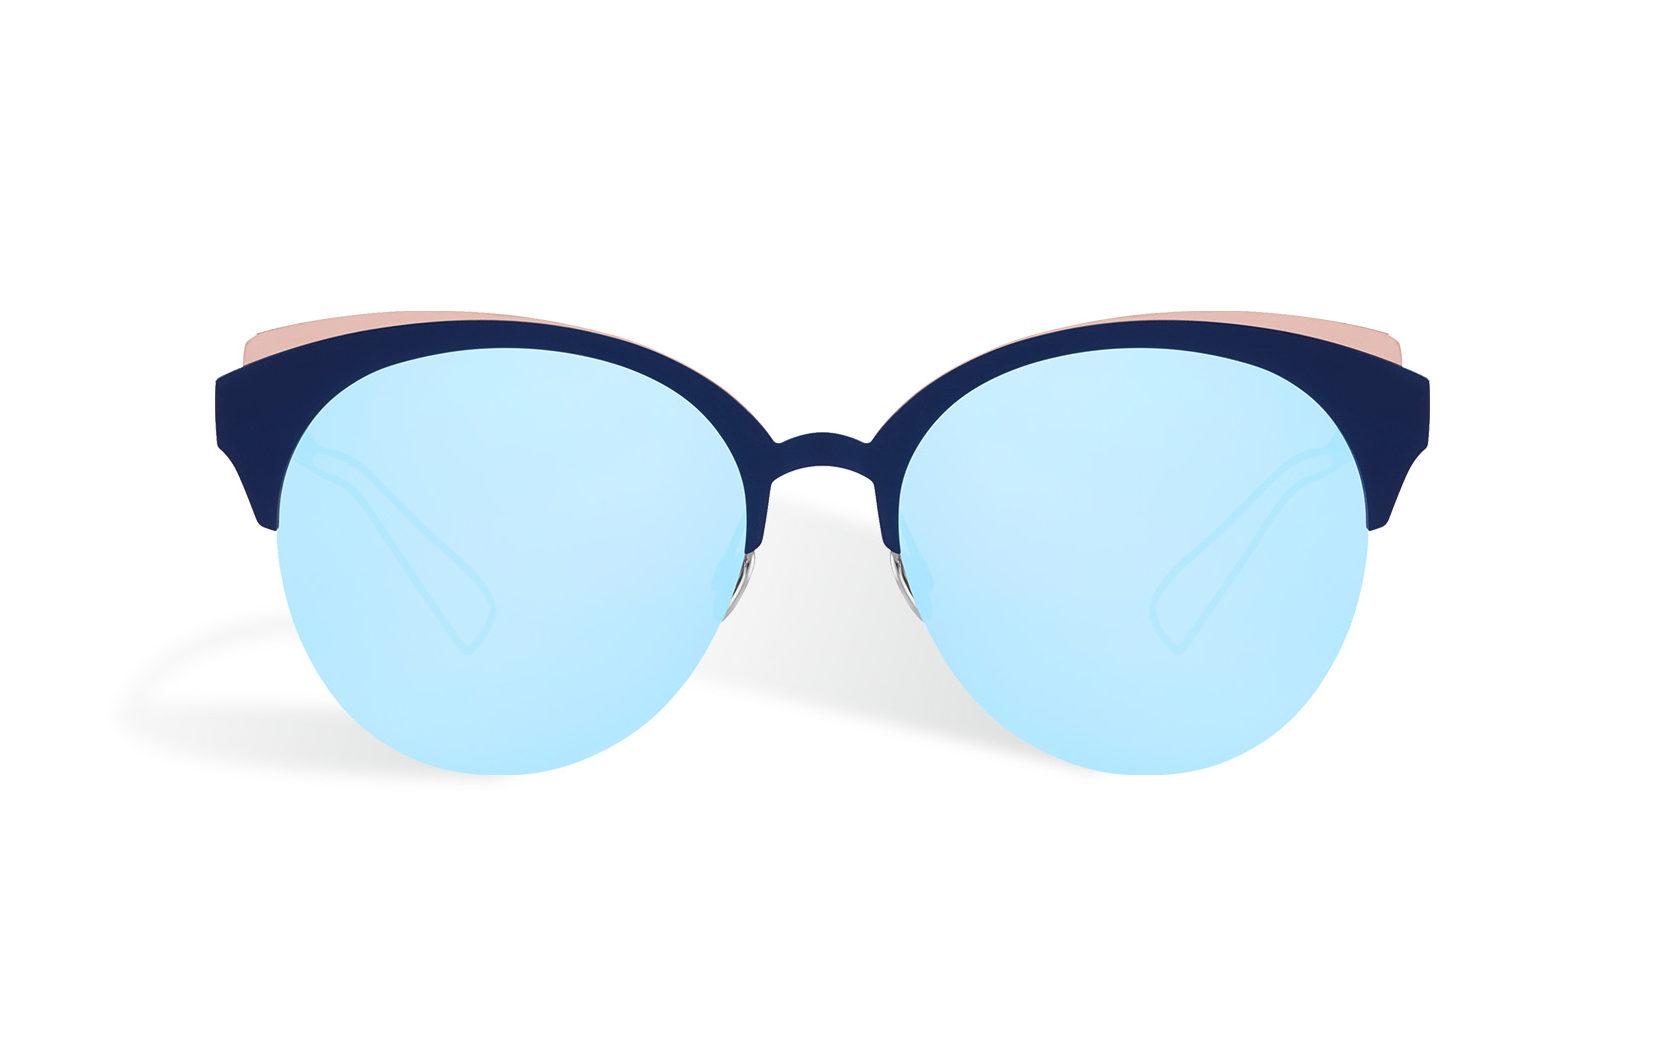 4b64144dfc75e Gafas de sol Dior Diorama Club - Óptica diferente en Barcelona